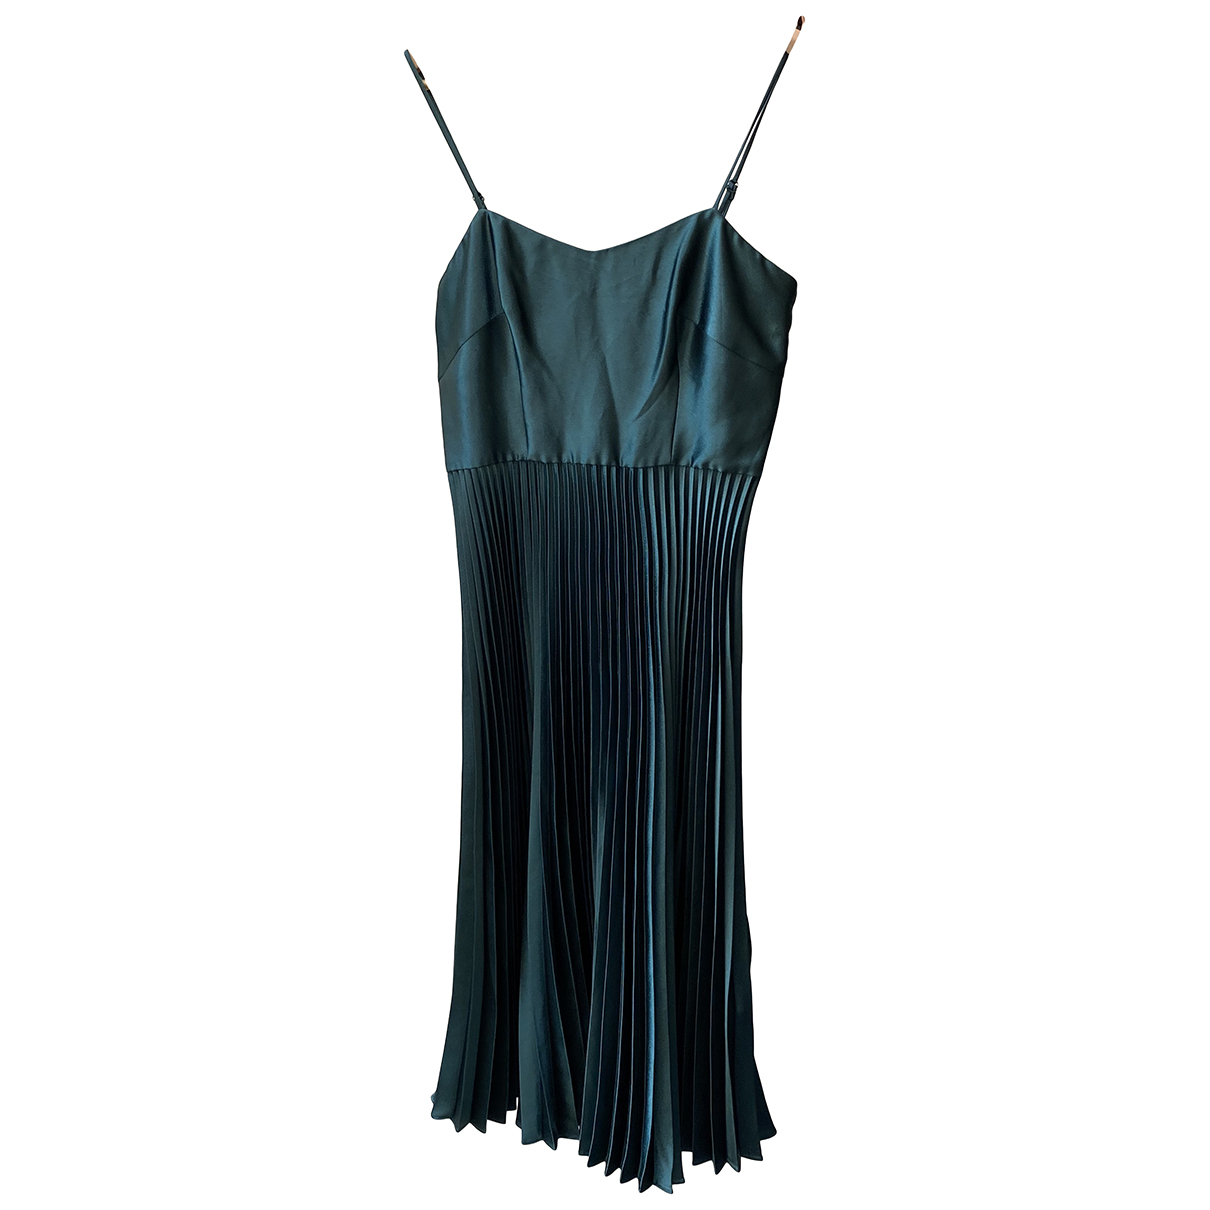 Whistles \N Kleid in  Gruen Polyester